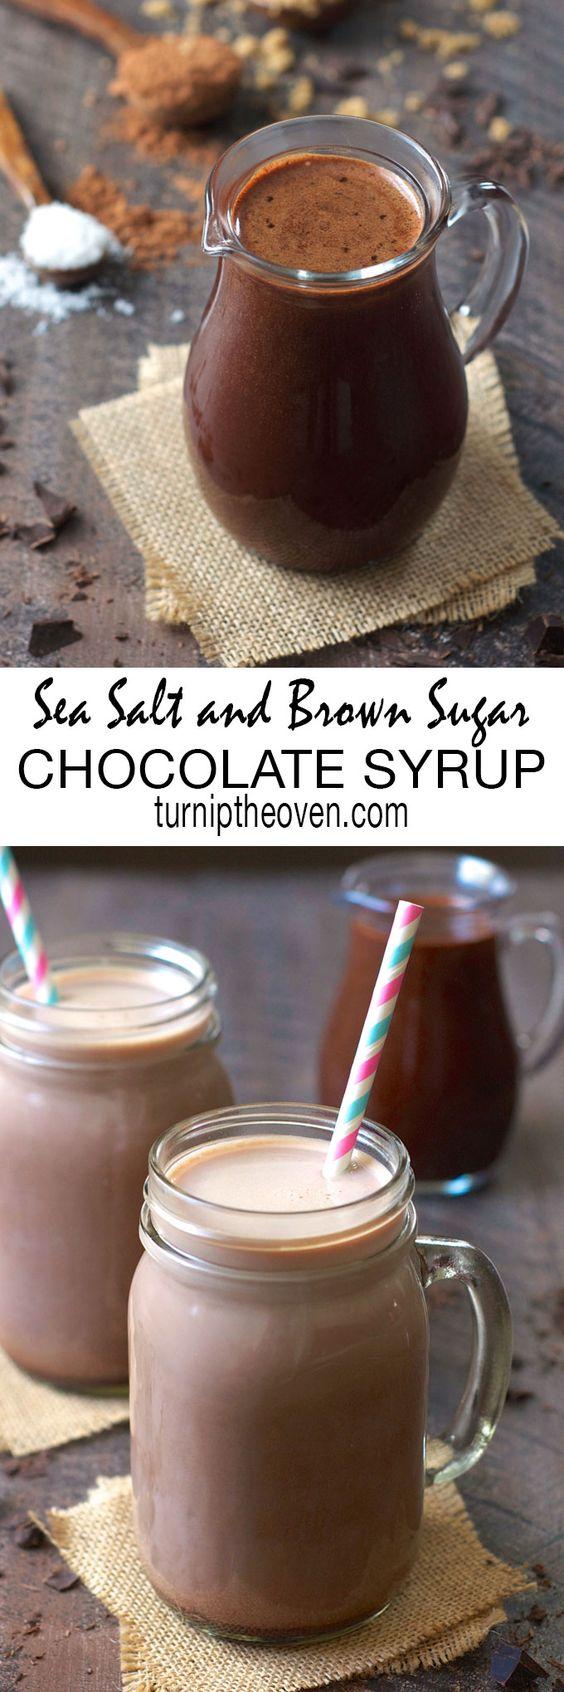 dips dark homemade chocolate sea salt simple vegans homemade chocolate ...